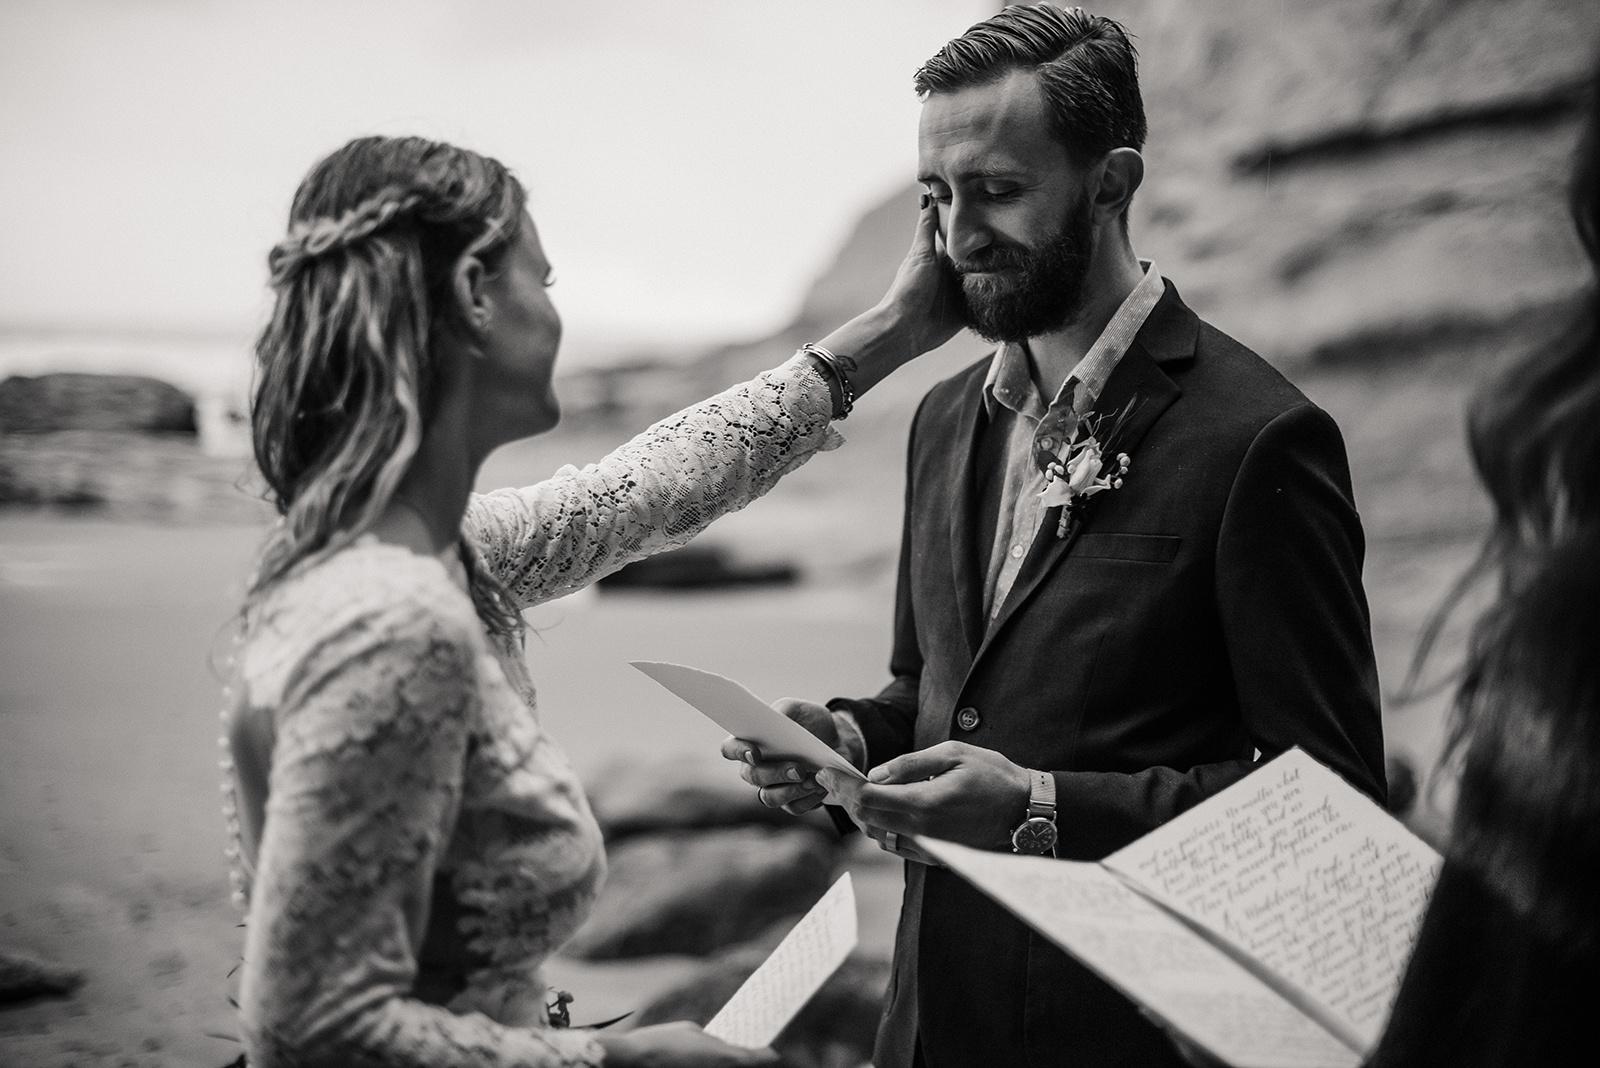 Oregon_Coast_Elopement_Wedding_The_Foxes_Photography_146.jpg